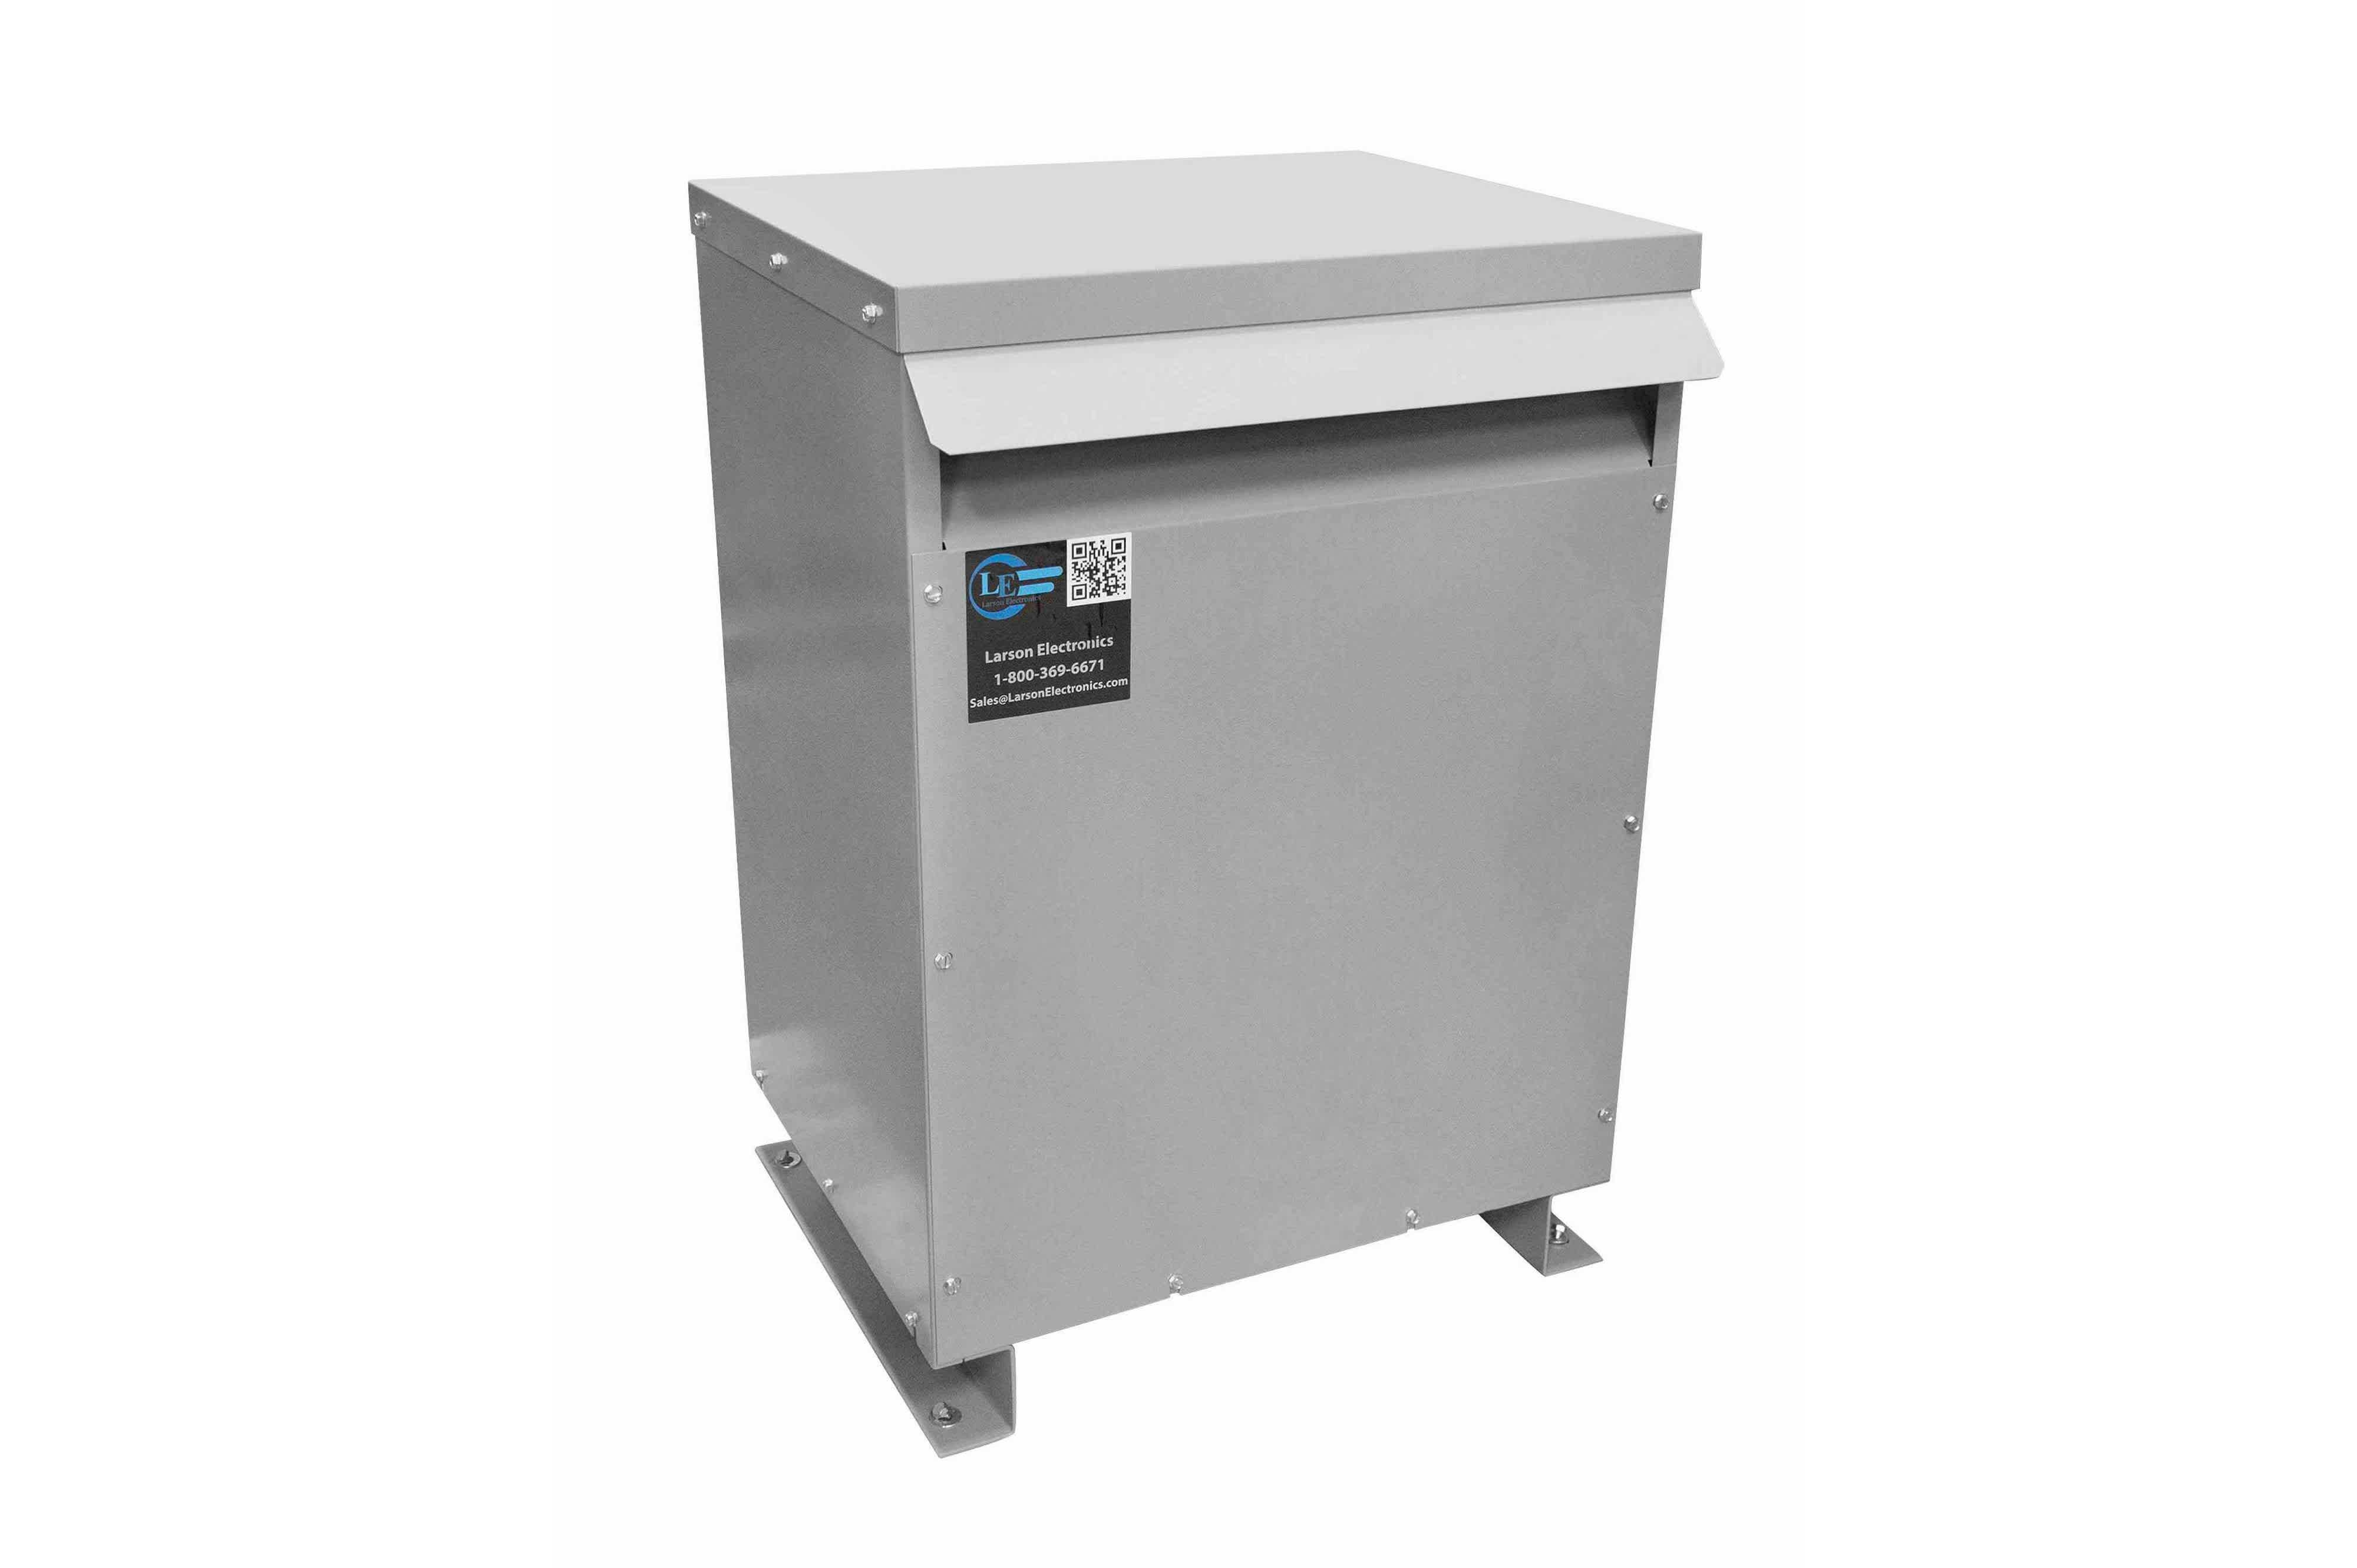 42.5 kVA 3PH Isolation Transformer, 208V Wye Primary, 480V Delta Secondary, N3R, Ventilated, 60 Hz